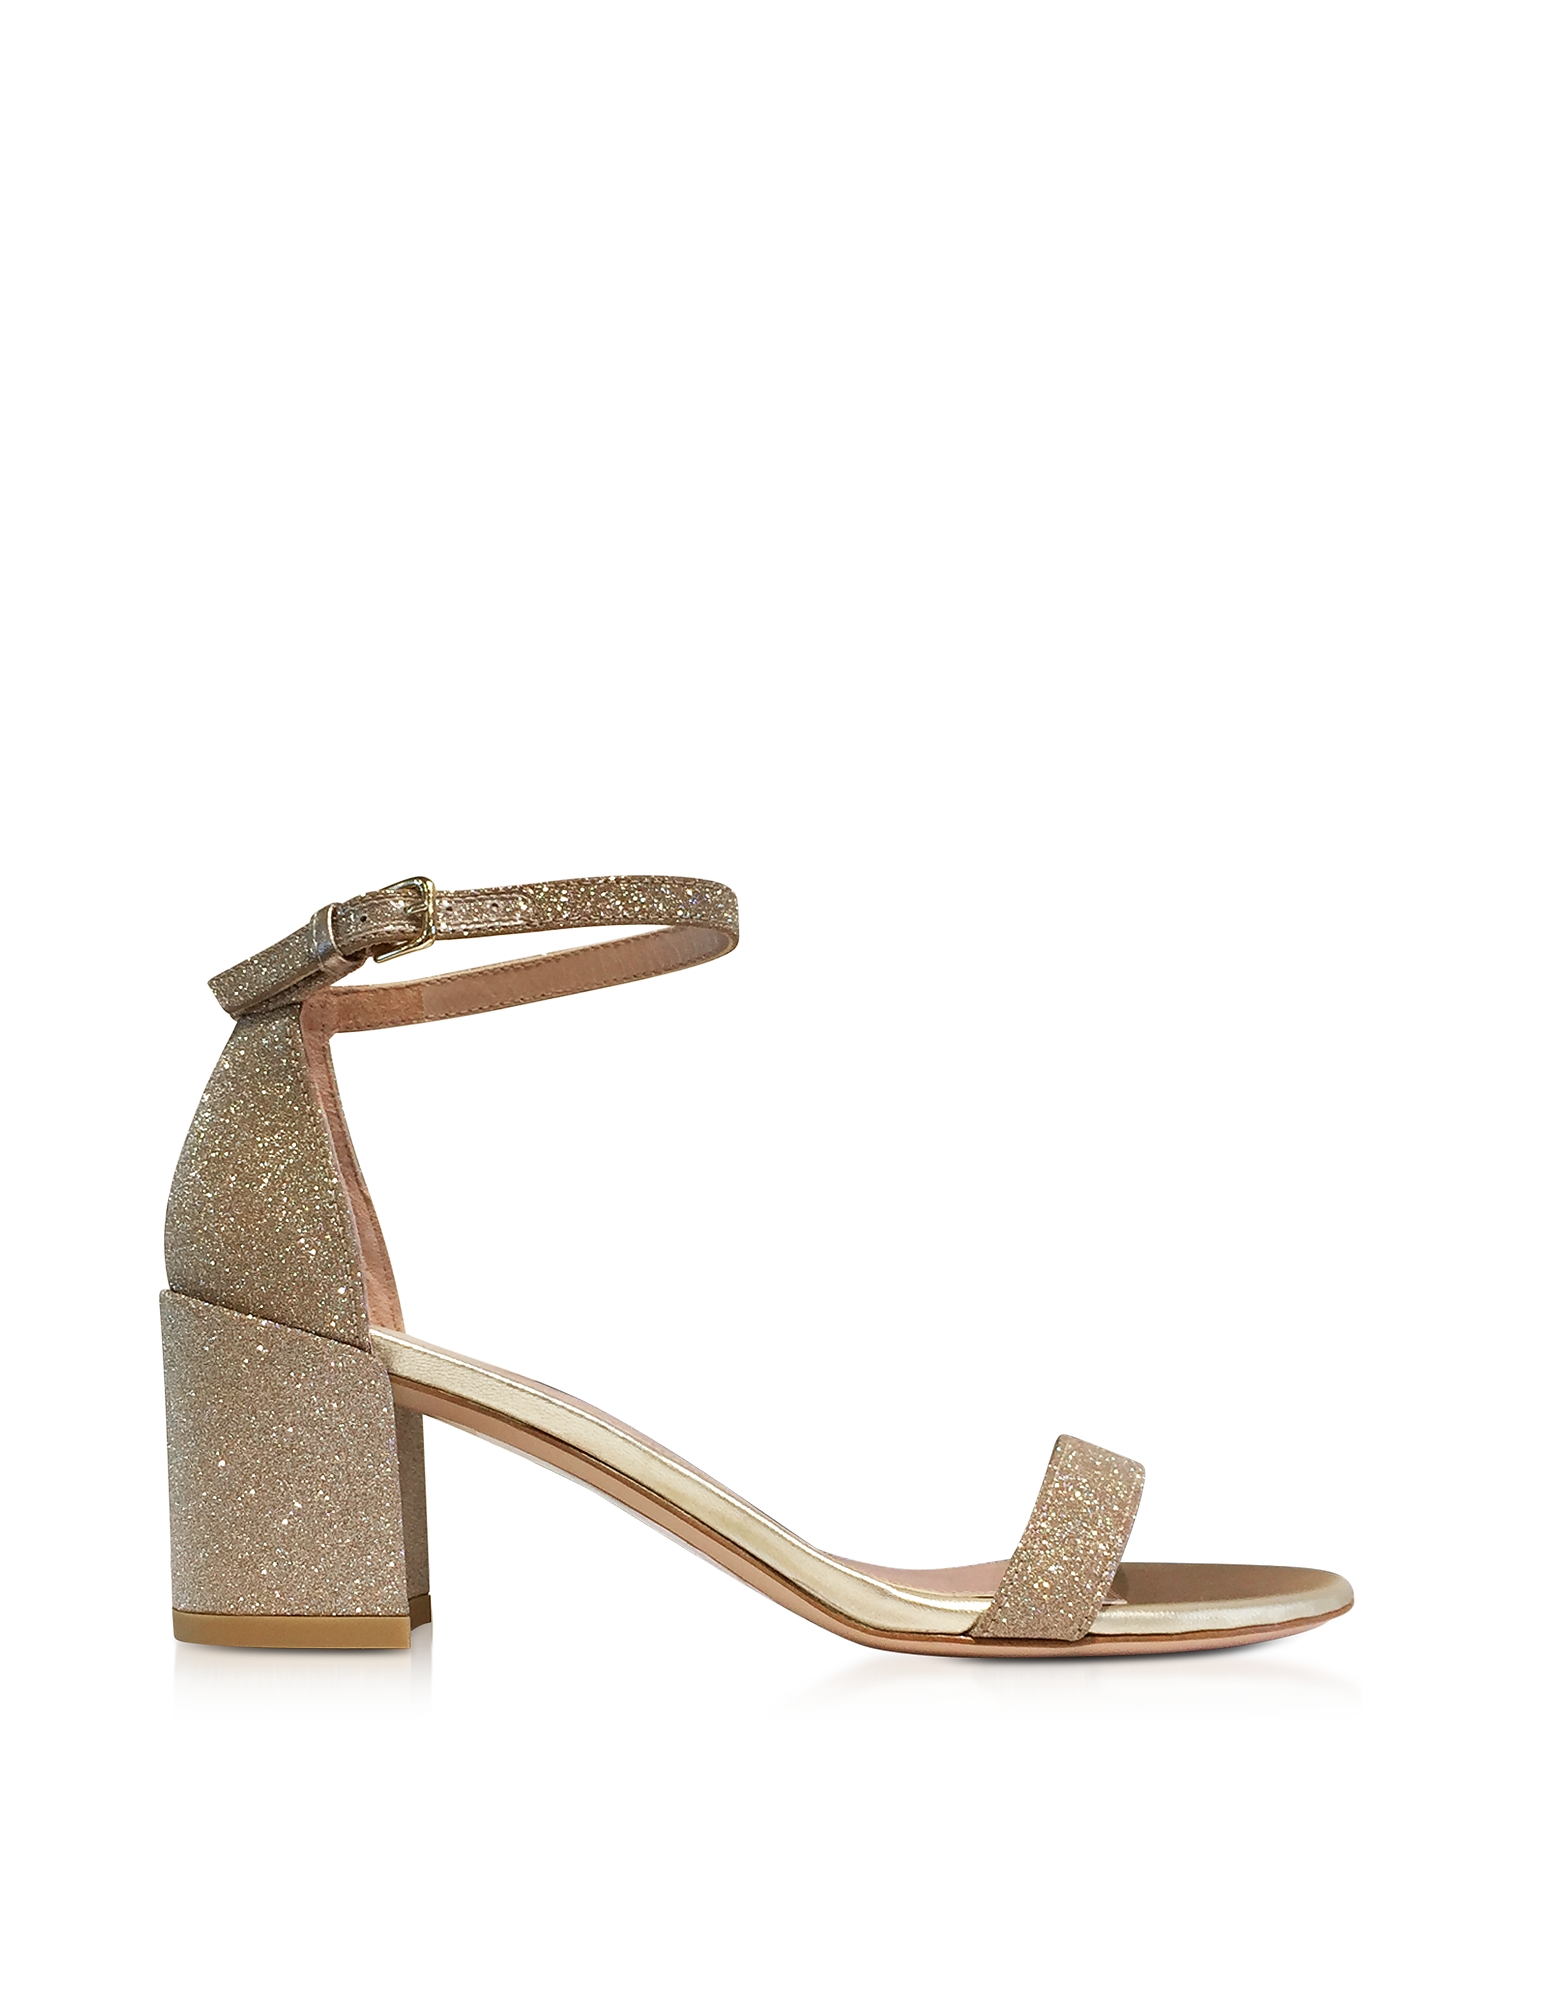 Stuart Weitzman Shoes, Simple Gold Glitter Mid Heel Sandals